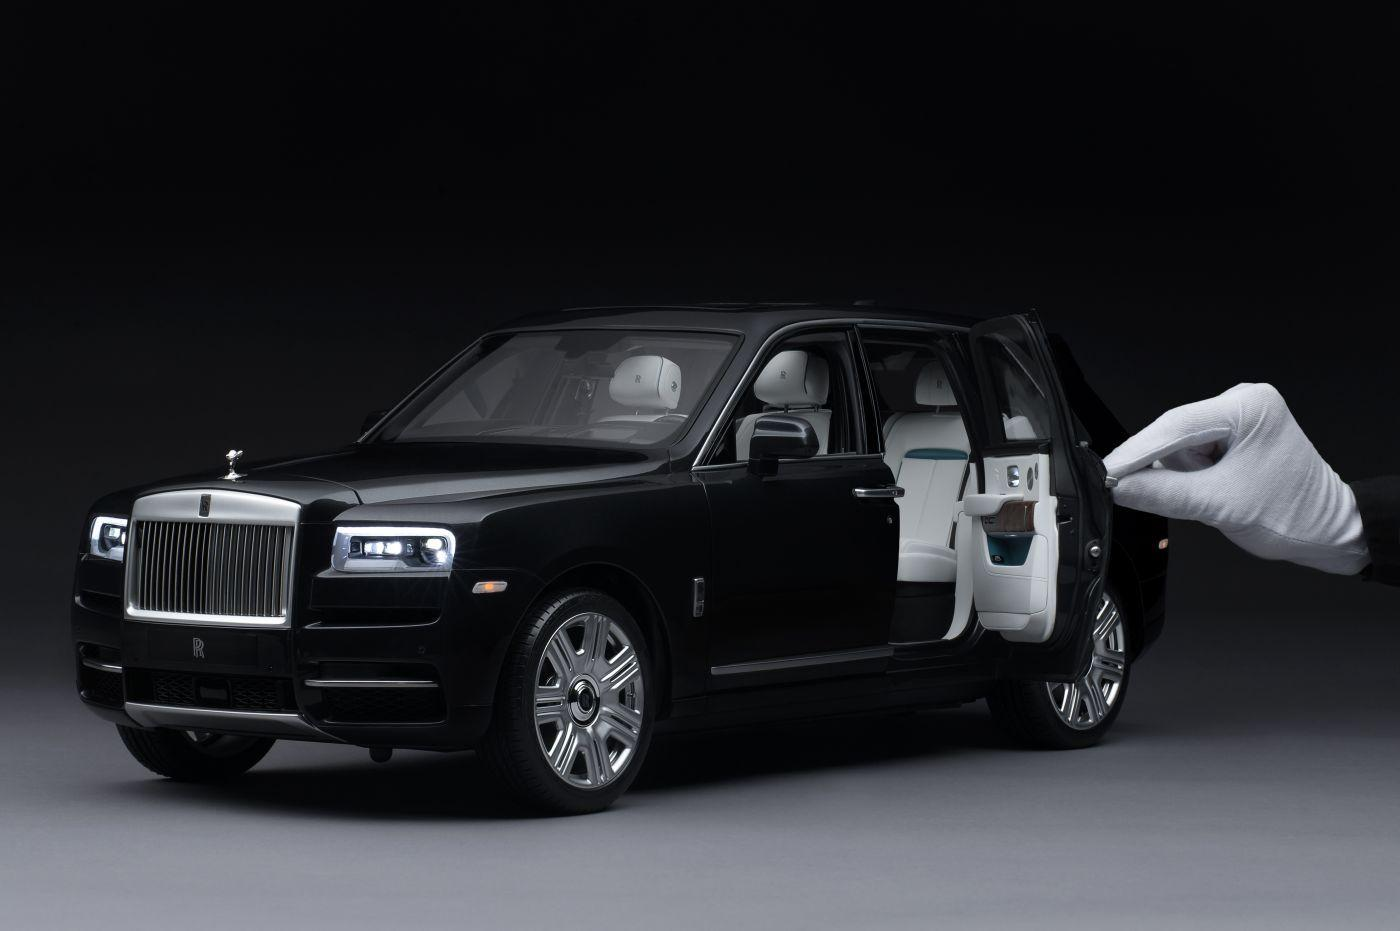 Rolls Royce Cullinan scale